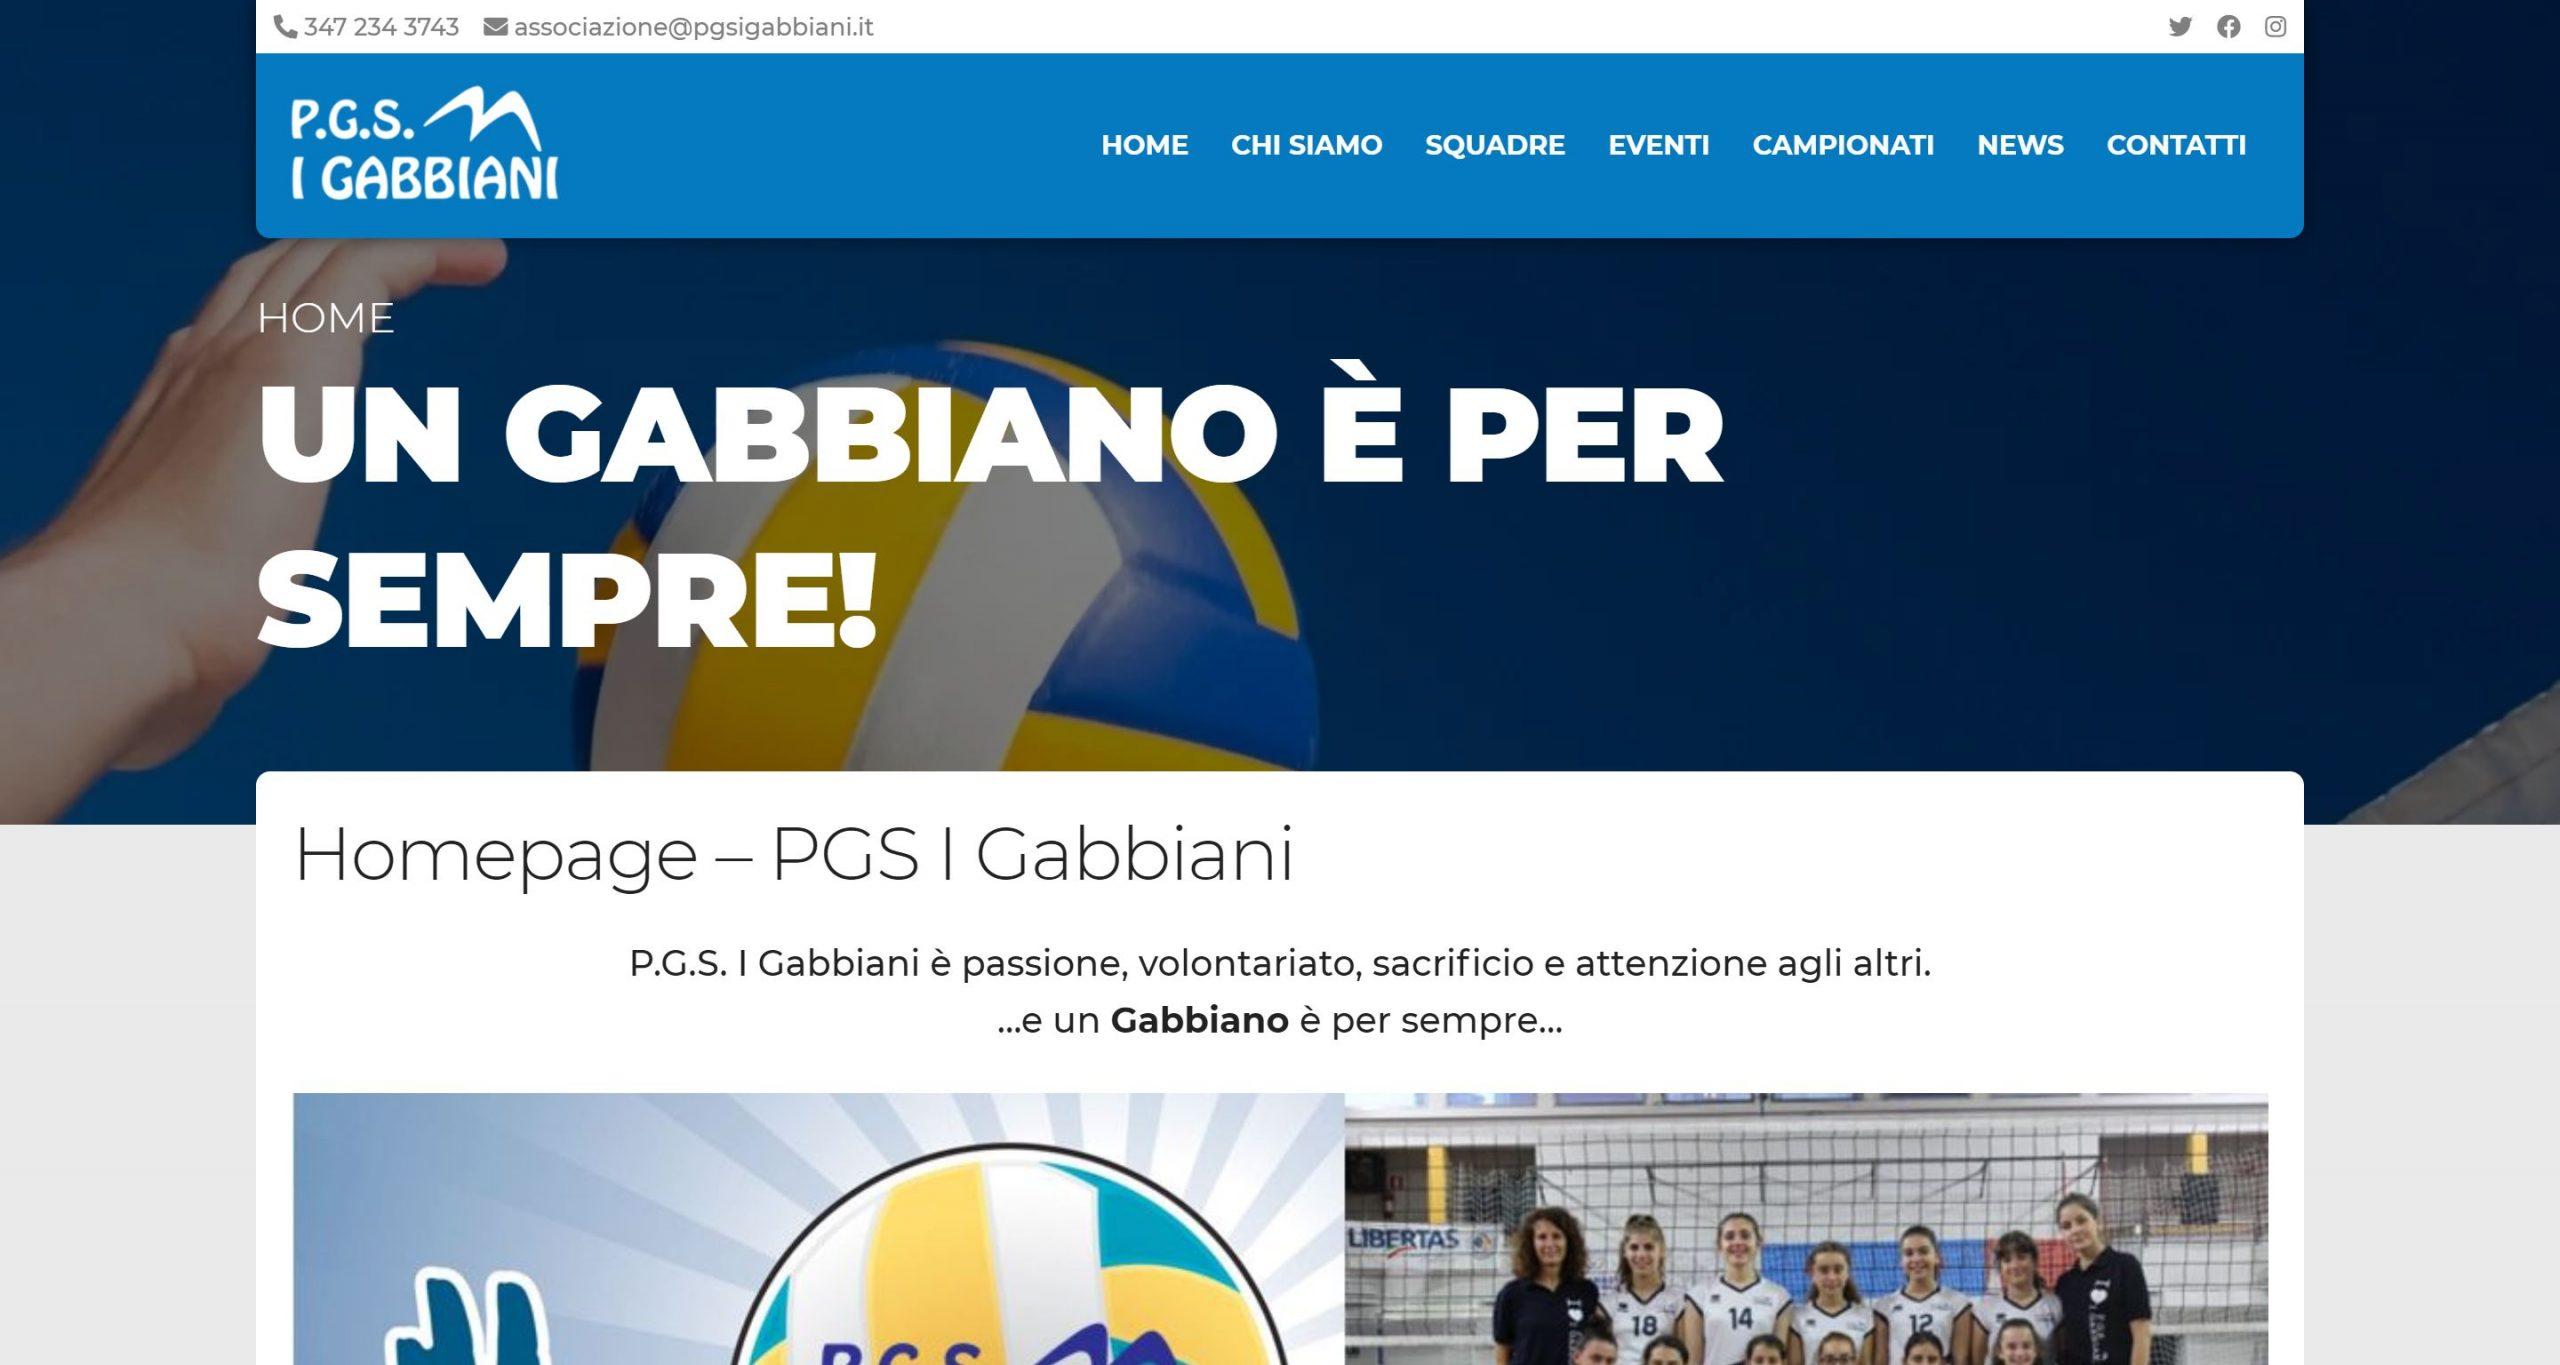 PGS I Gabbiani